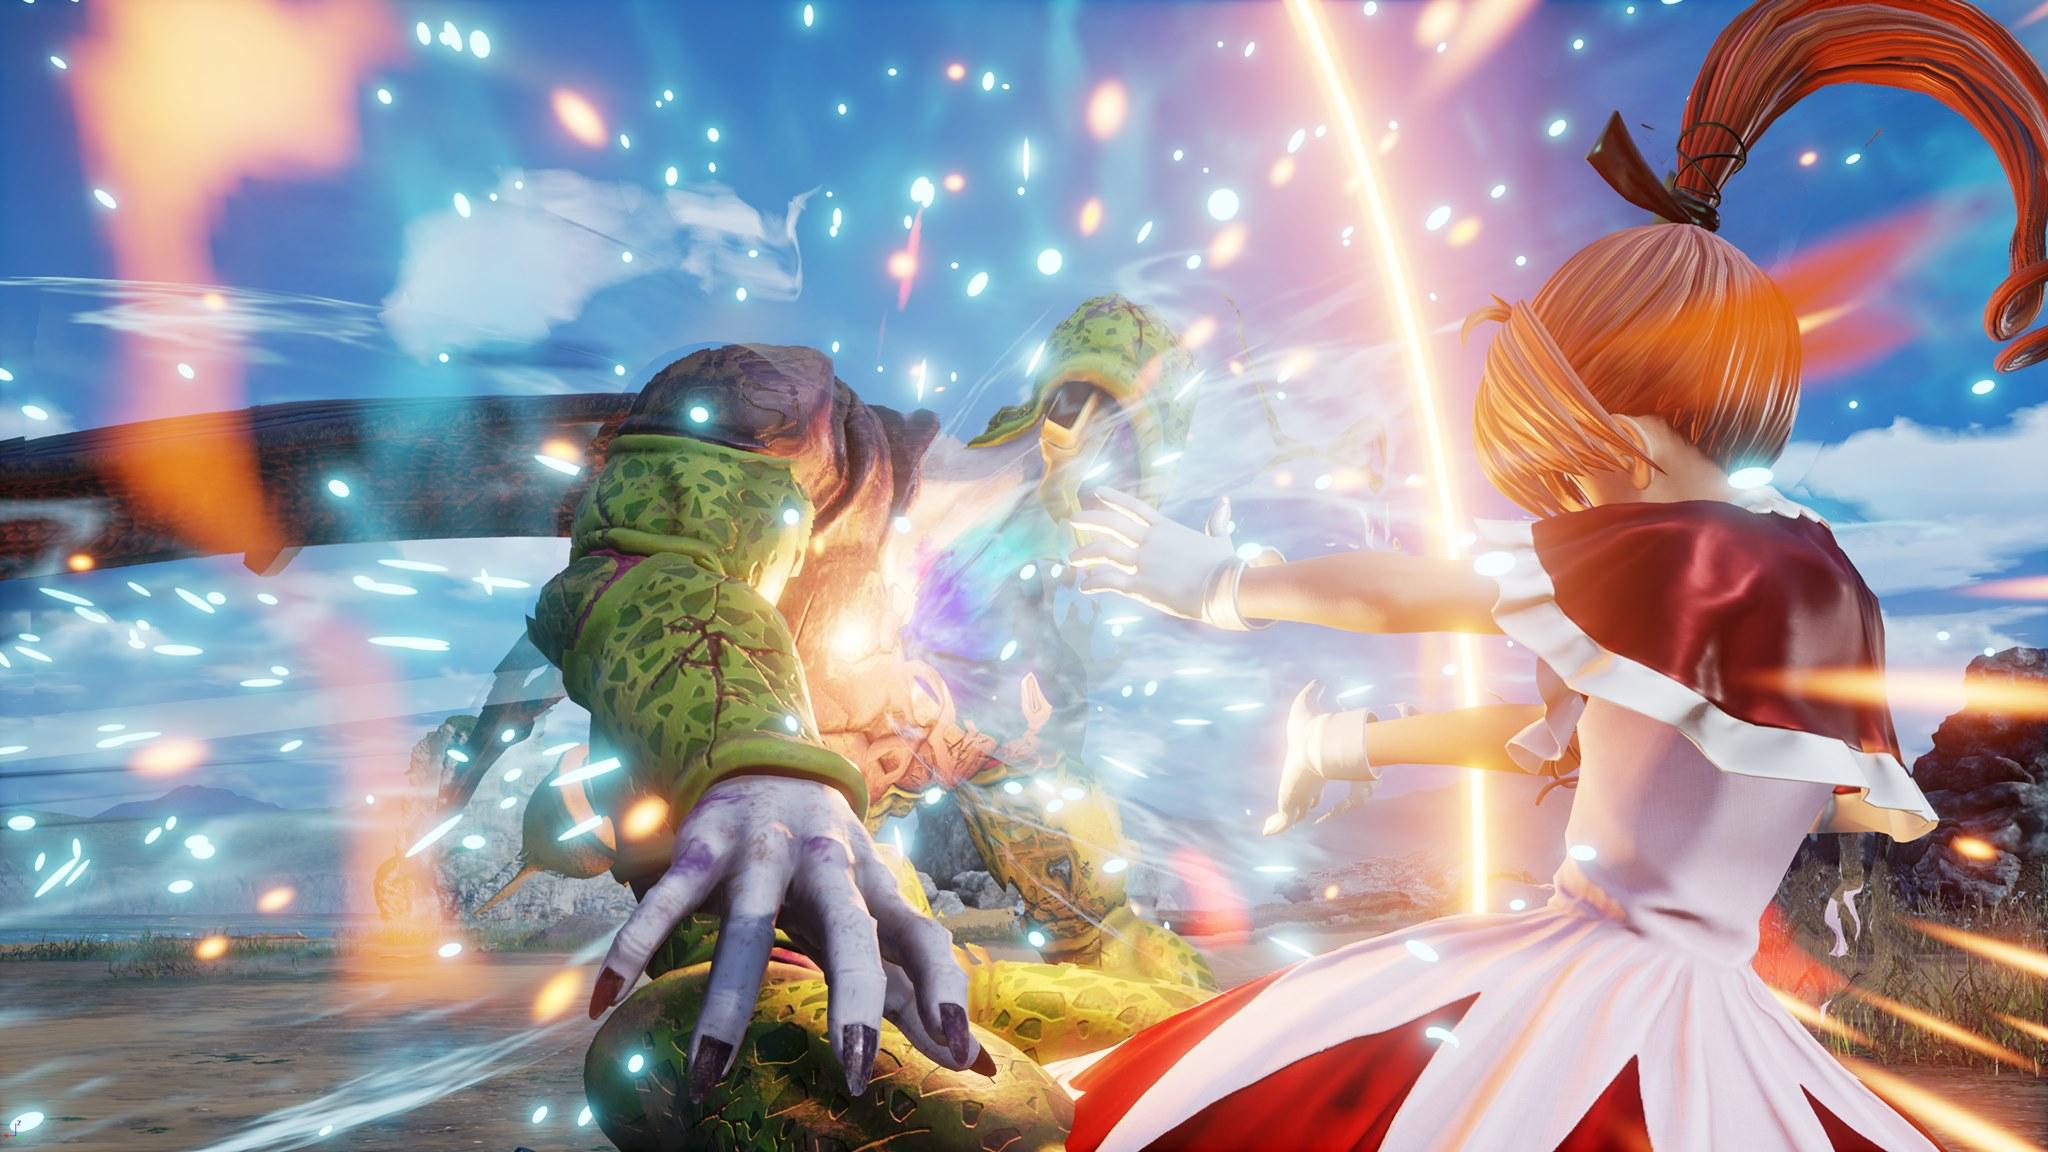 《Jump大乱斗》DLC角色比司吉酷露佳截图展示